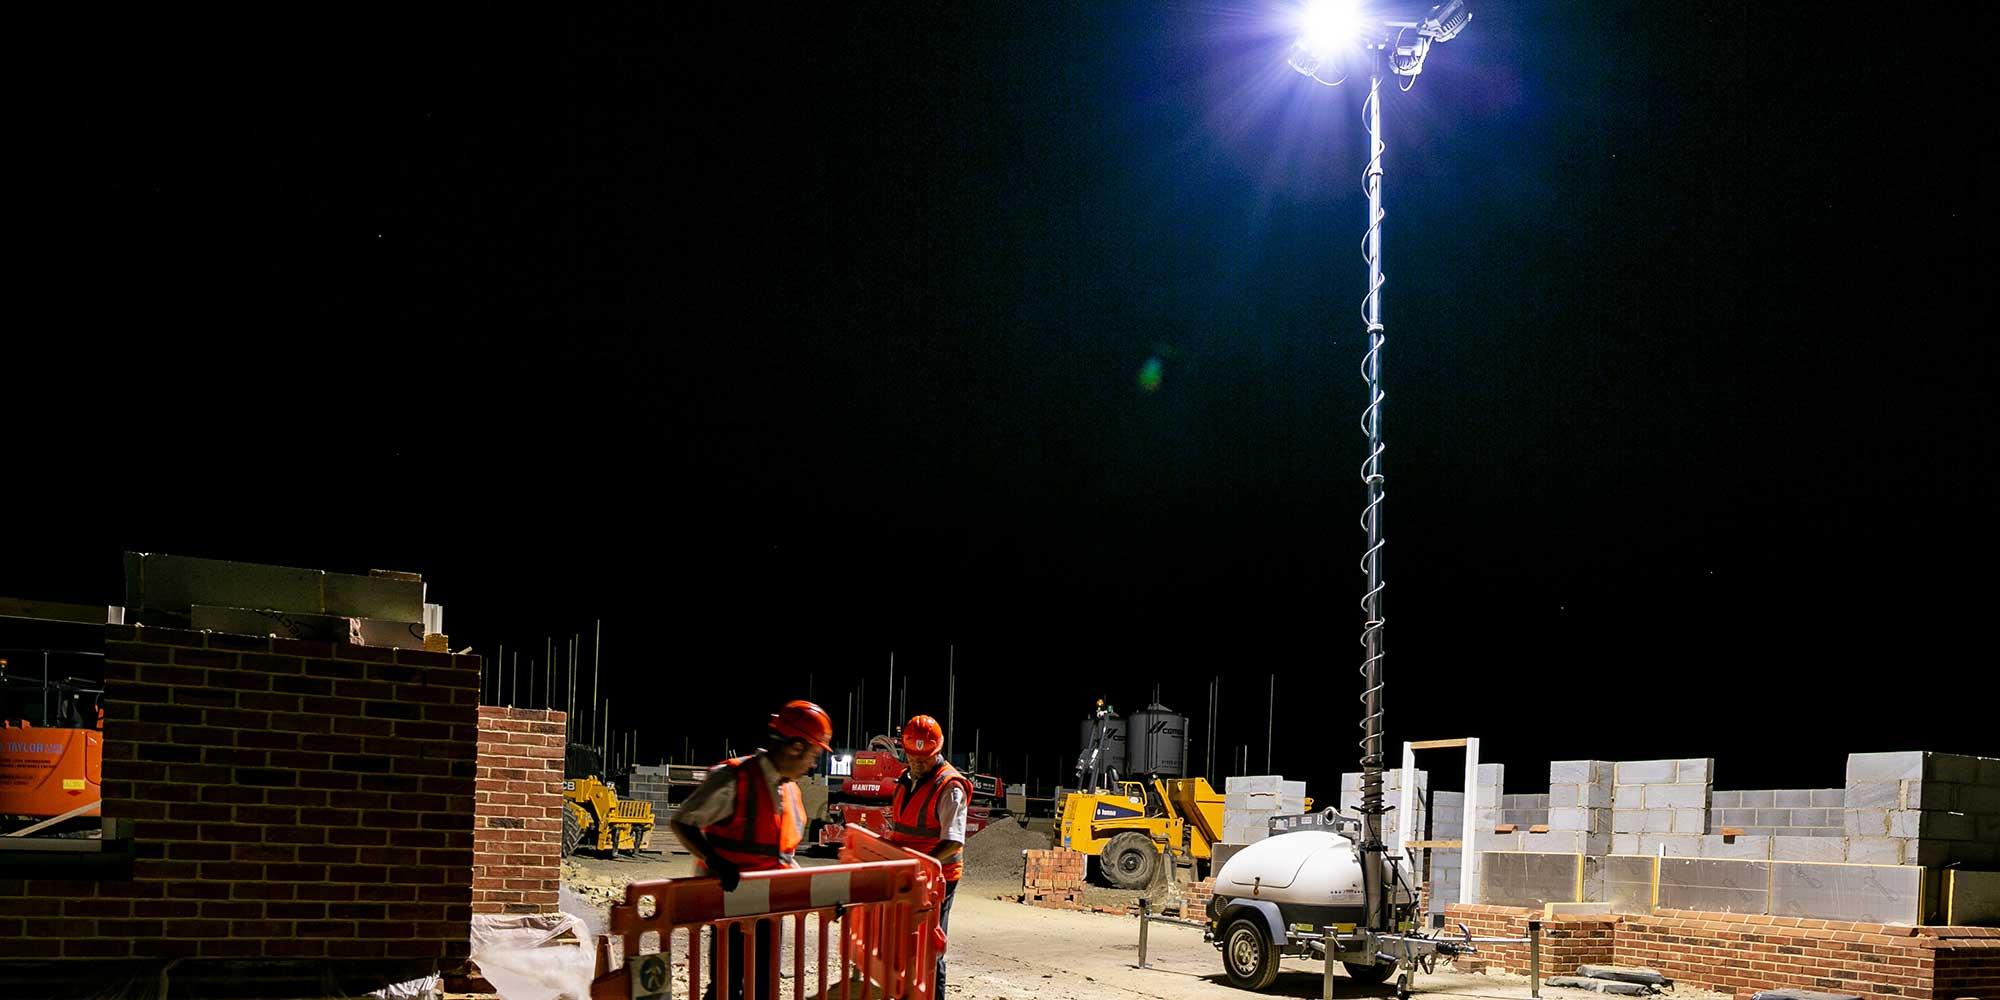 Ecolite-T Diesel portable lighting tower